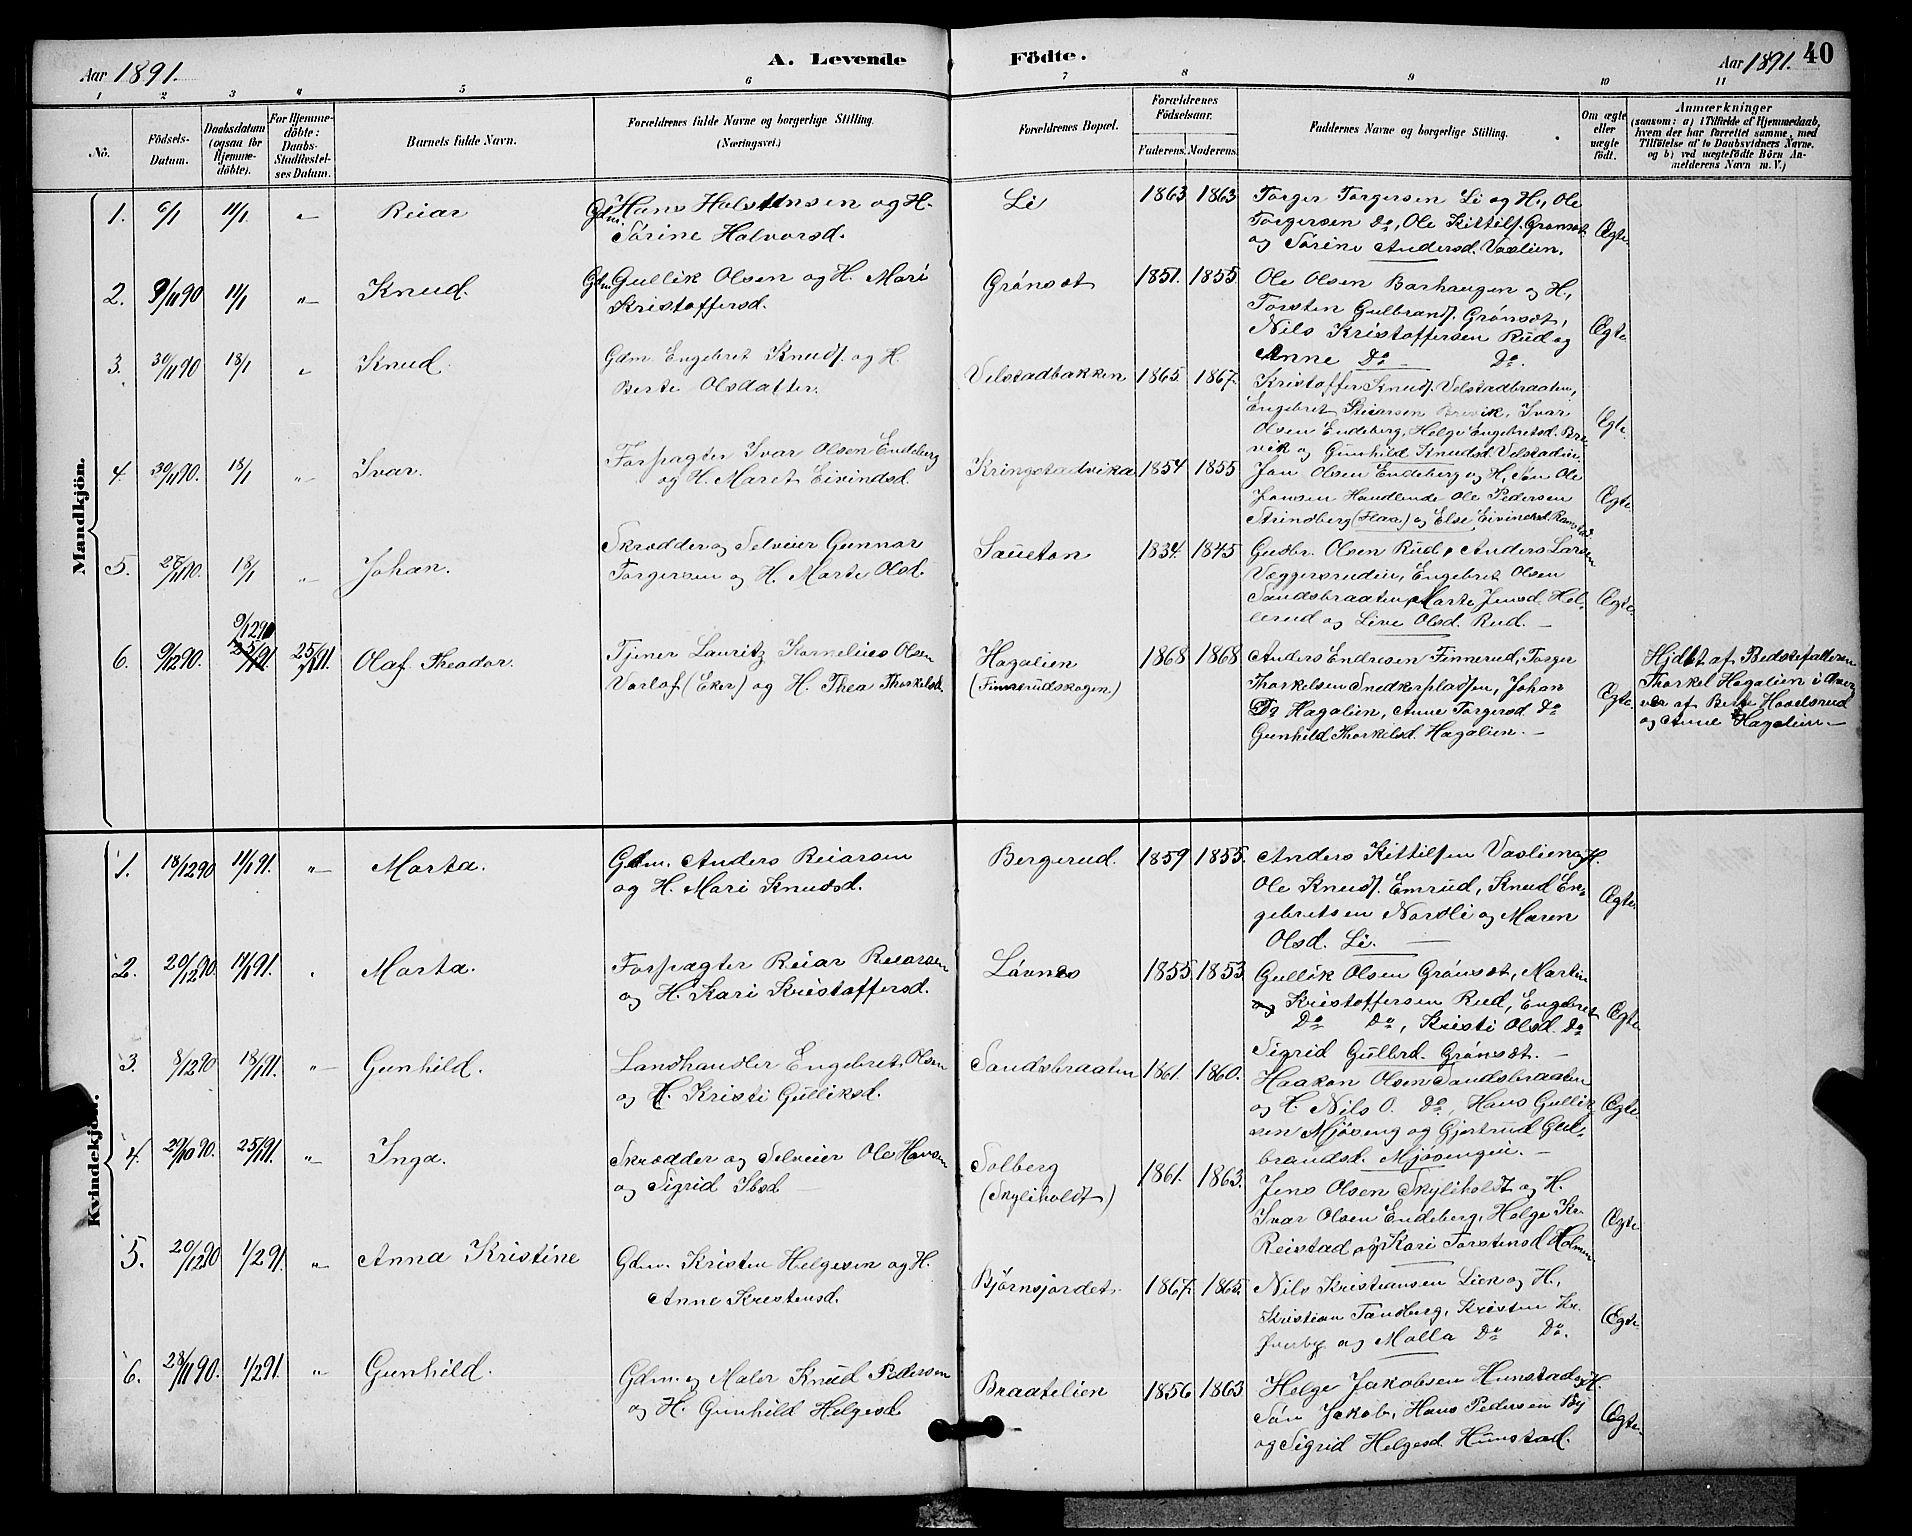 SAKO, Sigdal kirkebøker, G/Ga/L0005: Klokkerbok nr. I 5, 1886-1900, s. 40